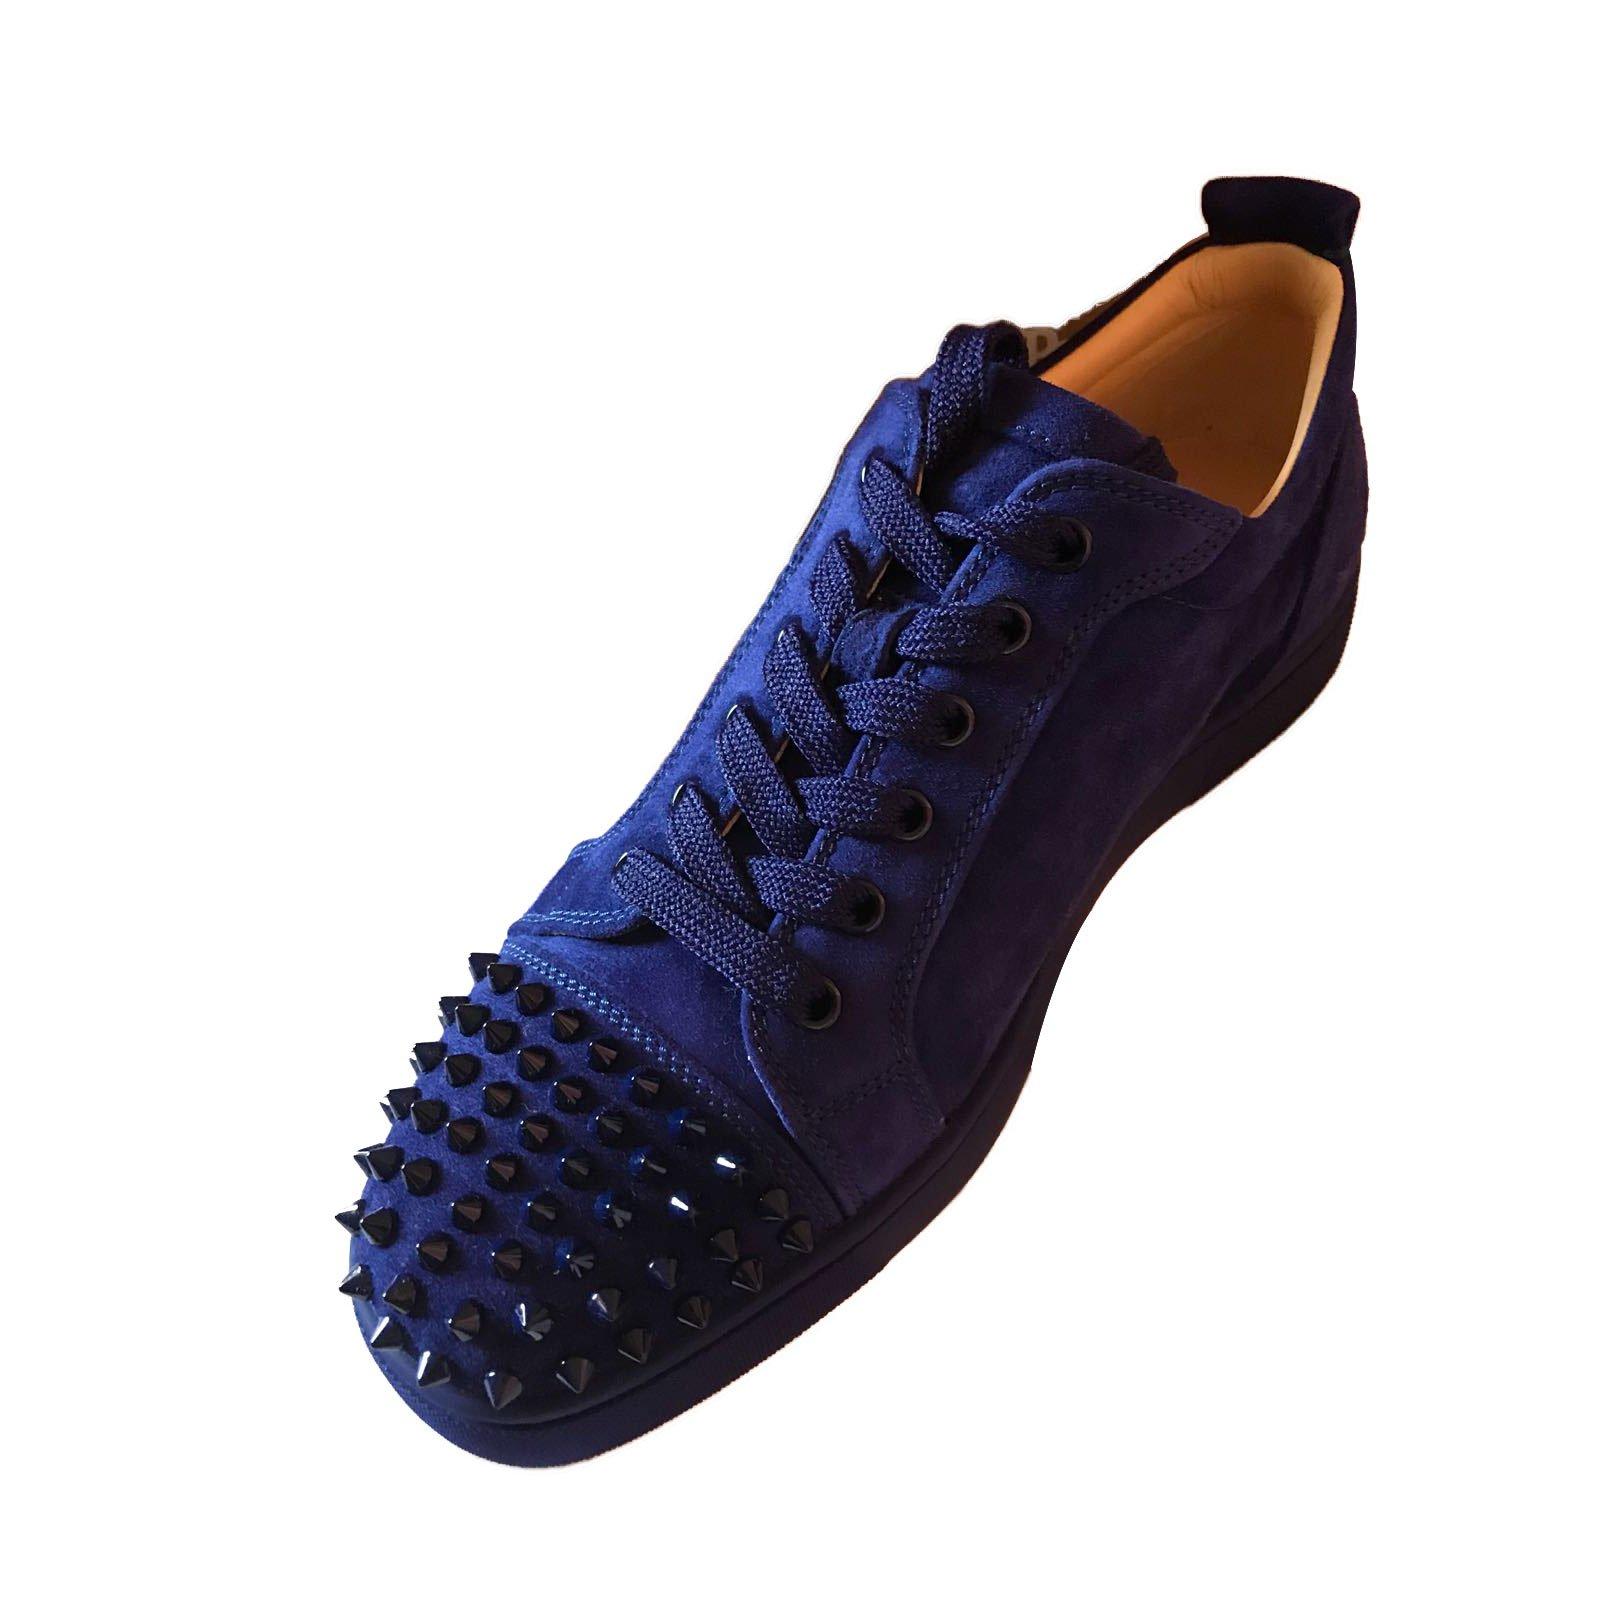 vente chaude en ligne 45bbf d1222 sneakers